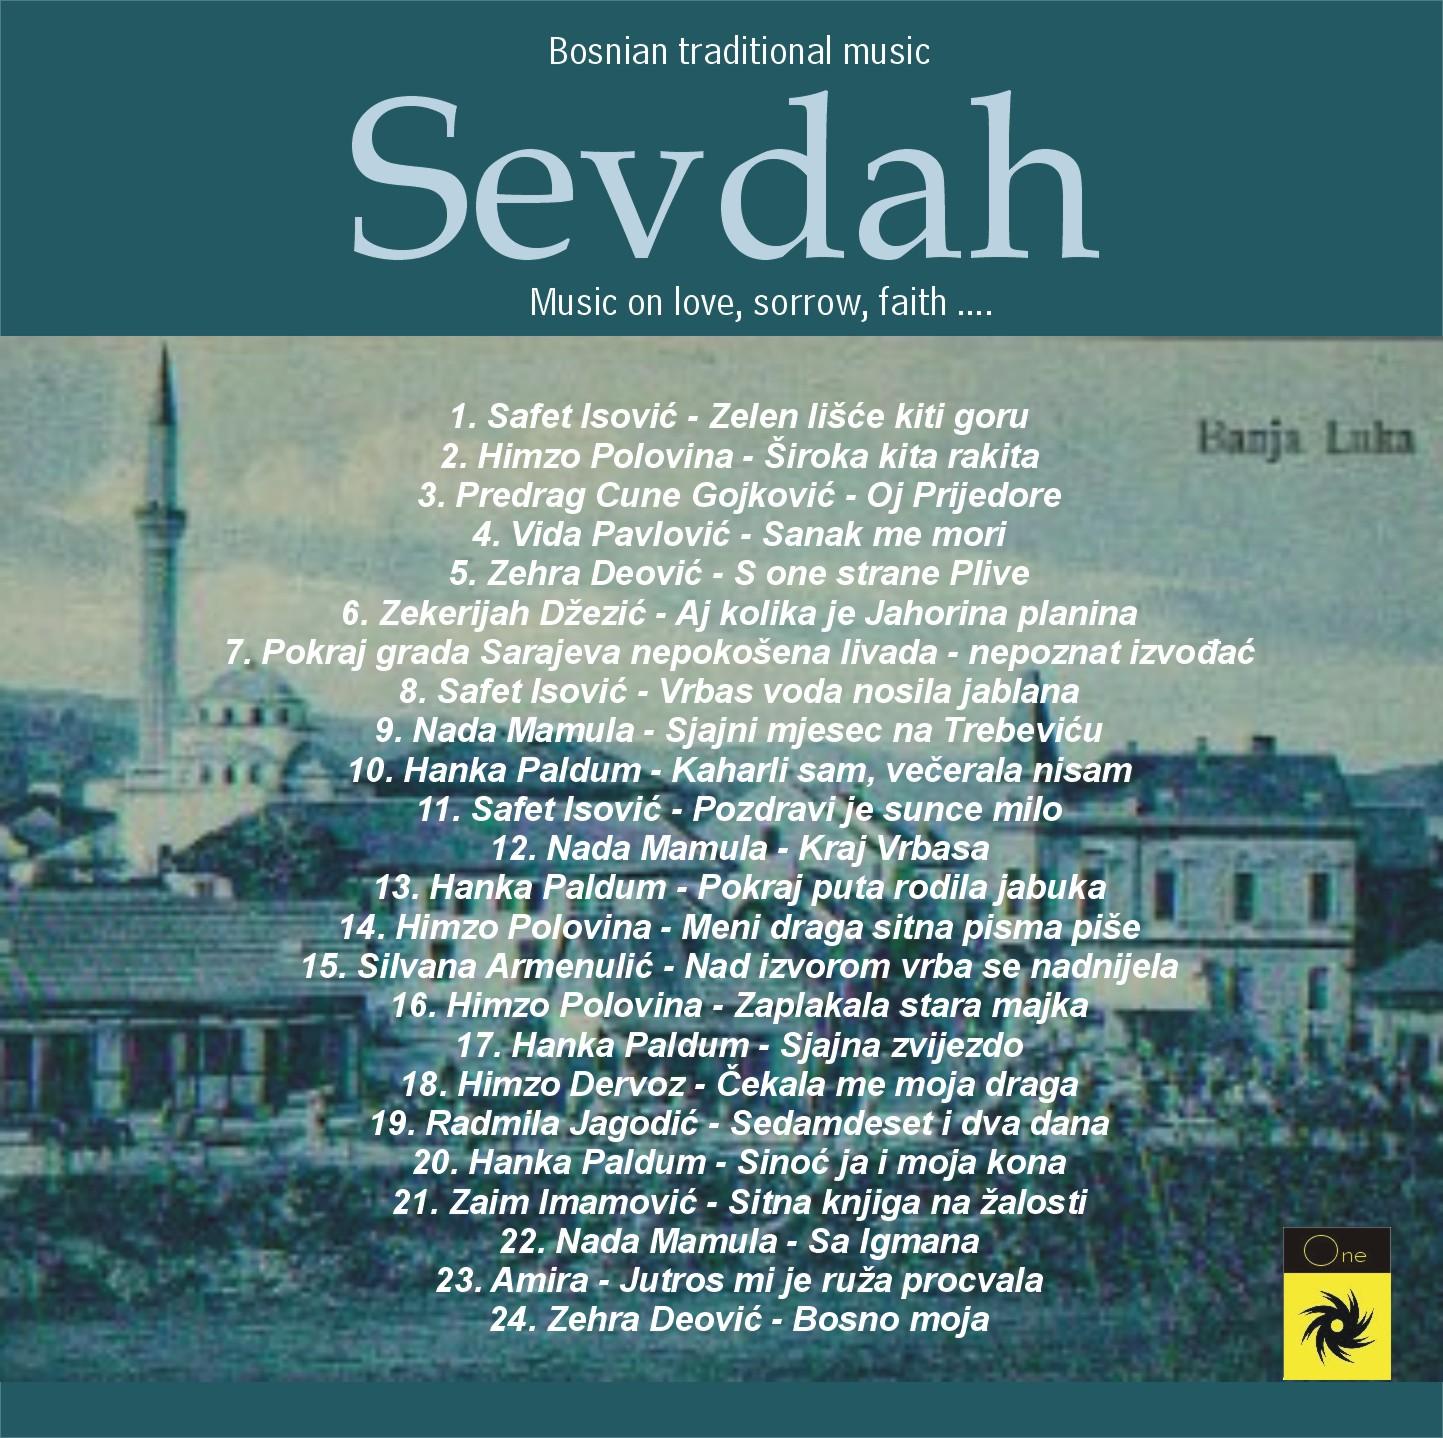 BOSNIAN TRADITIONAL MUSIC 2 - VARIOUS ARTISTS